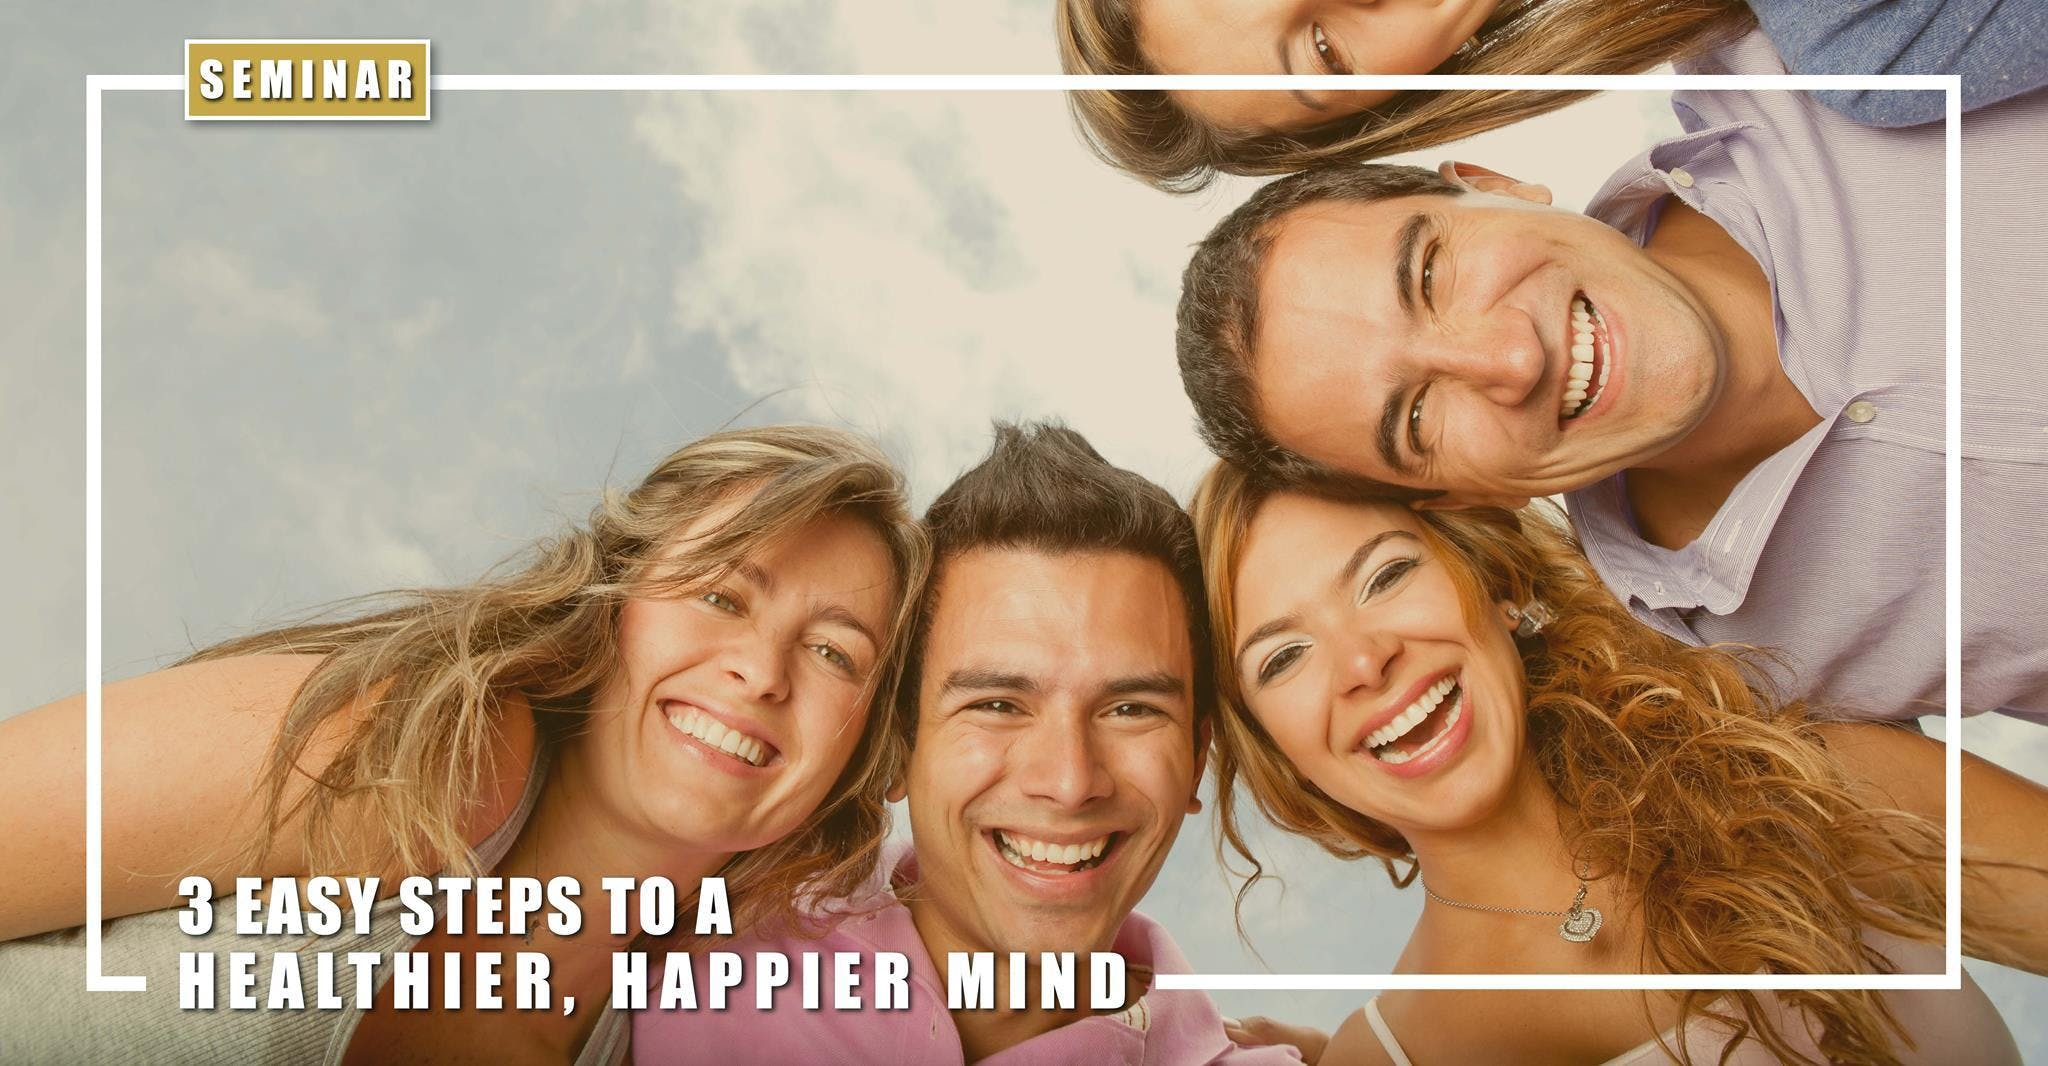 3 Steps to a Healthier Happier Mind Seminar in Dublin